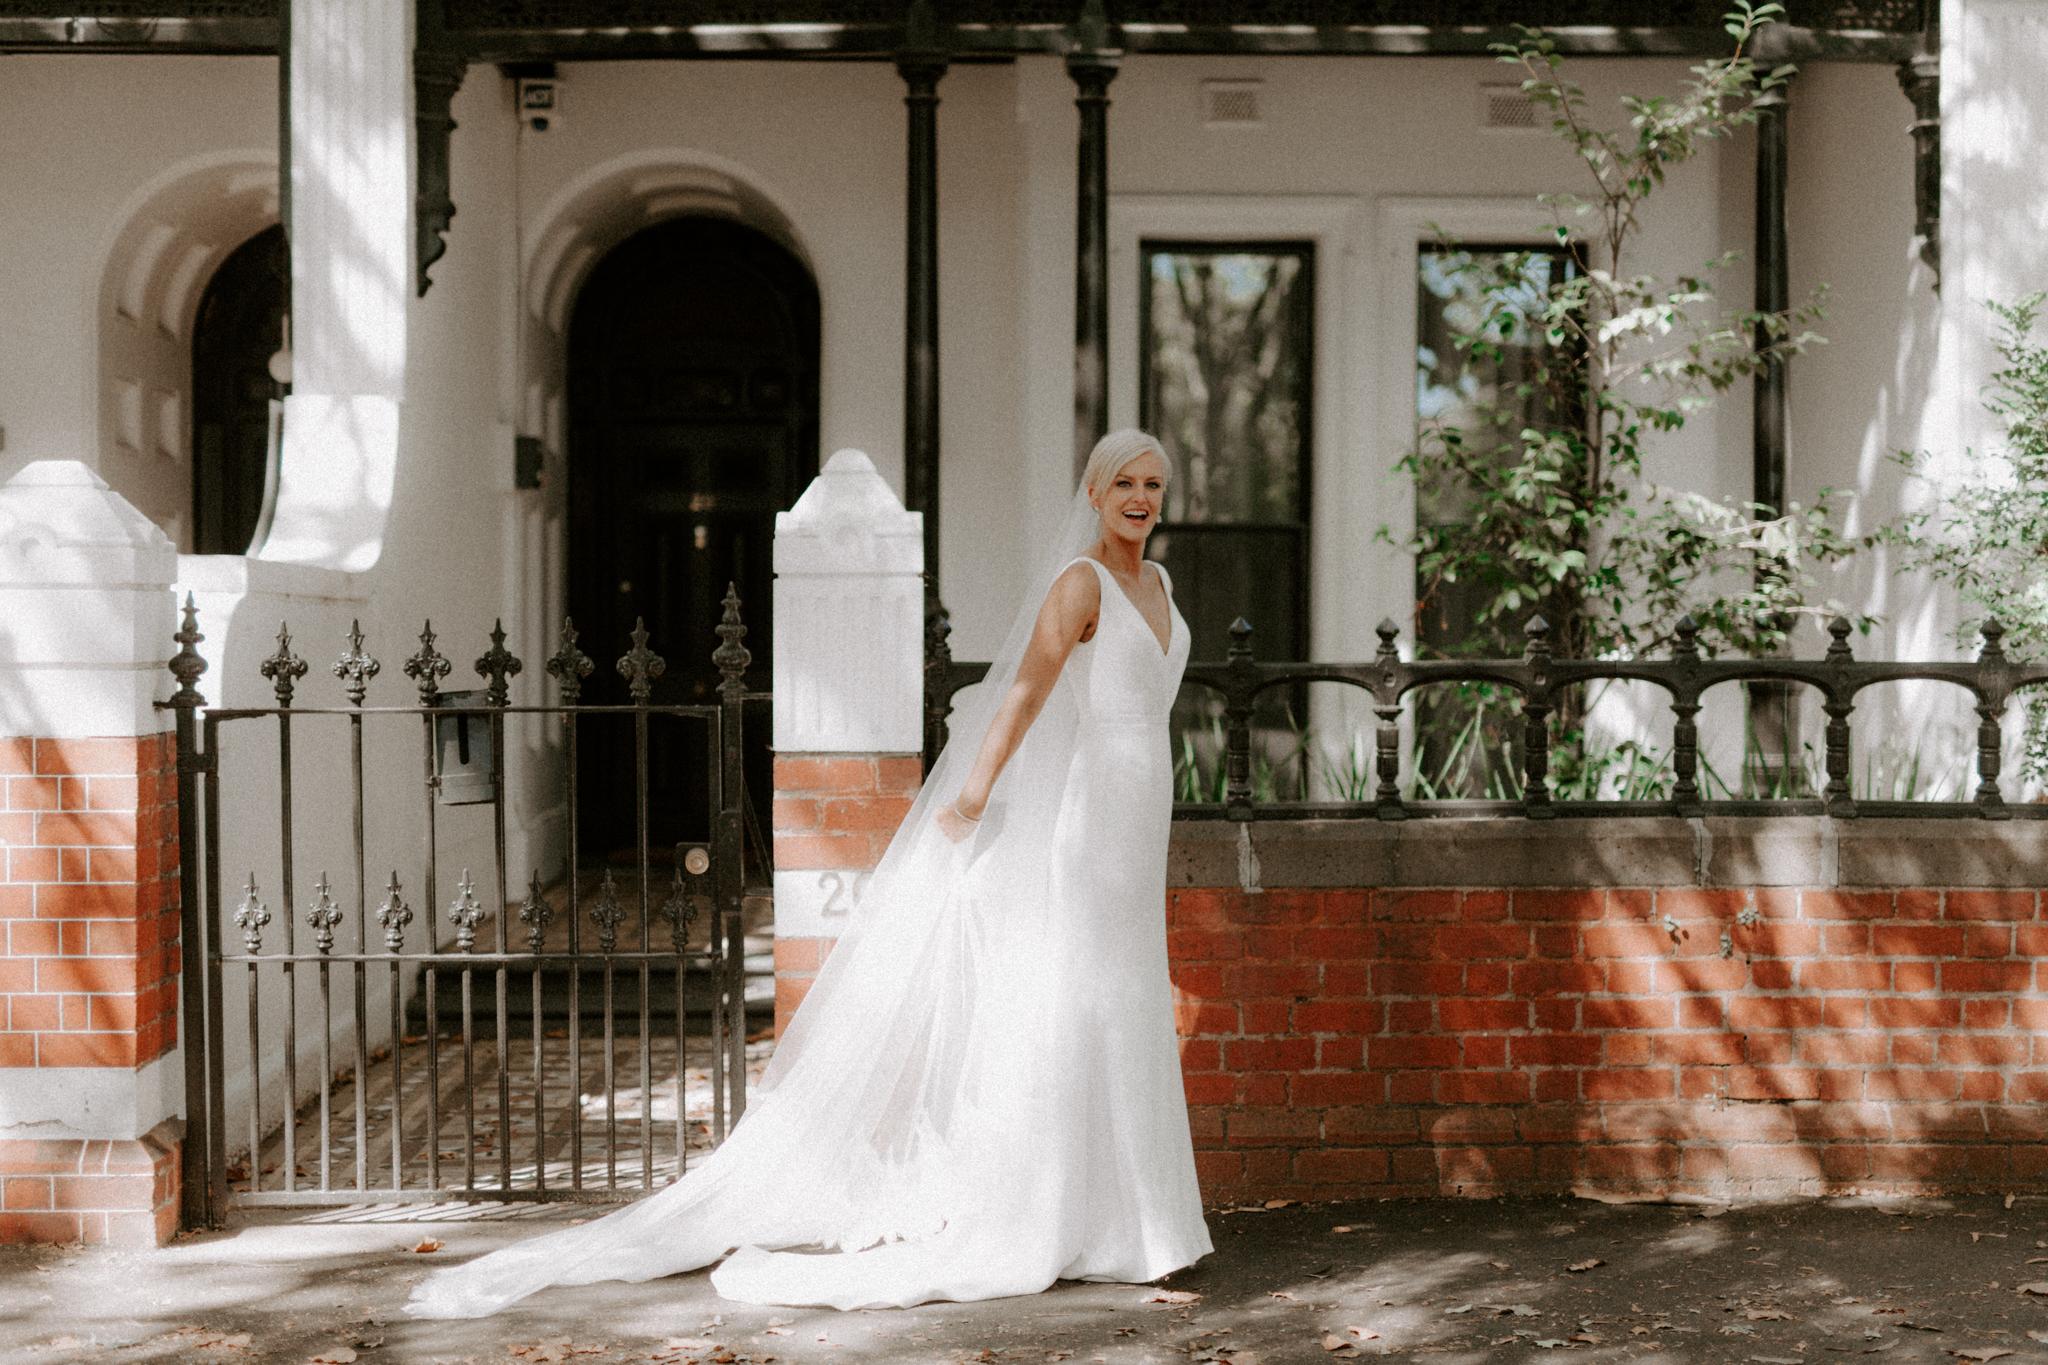 St-Kilda-Garden-Wedding-Emotions-and-Math-Photograph-092.jpg